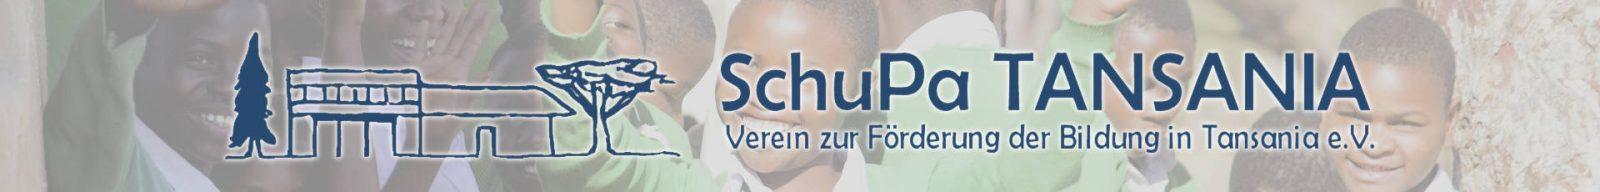 SchuPa Tansania Header mit Logo 1920x230